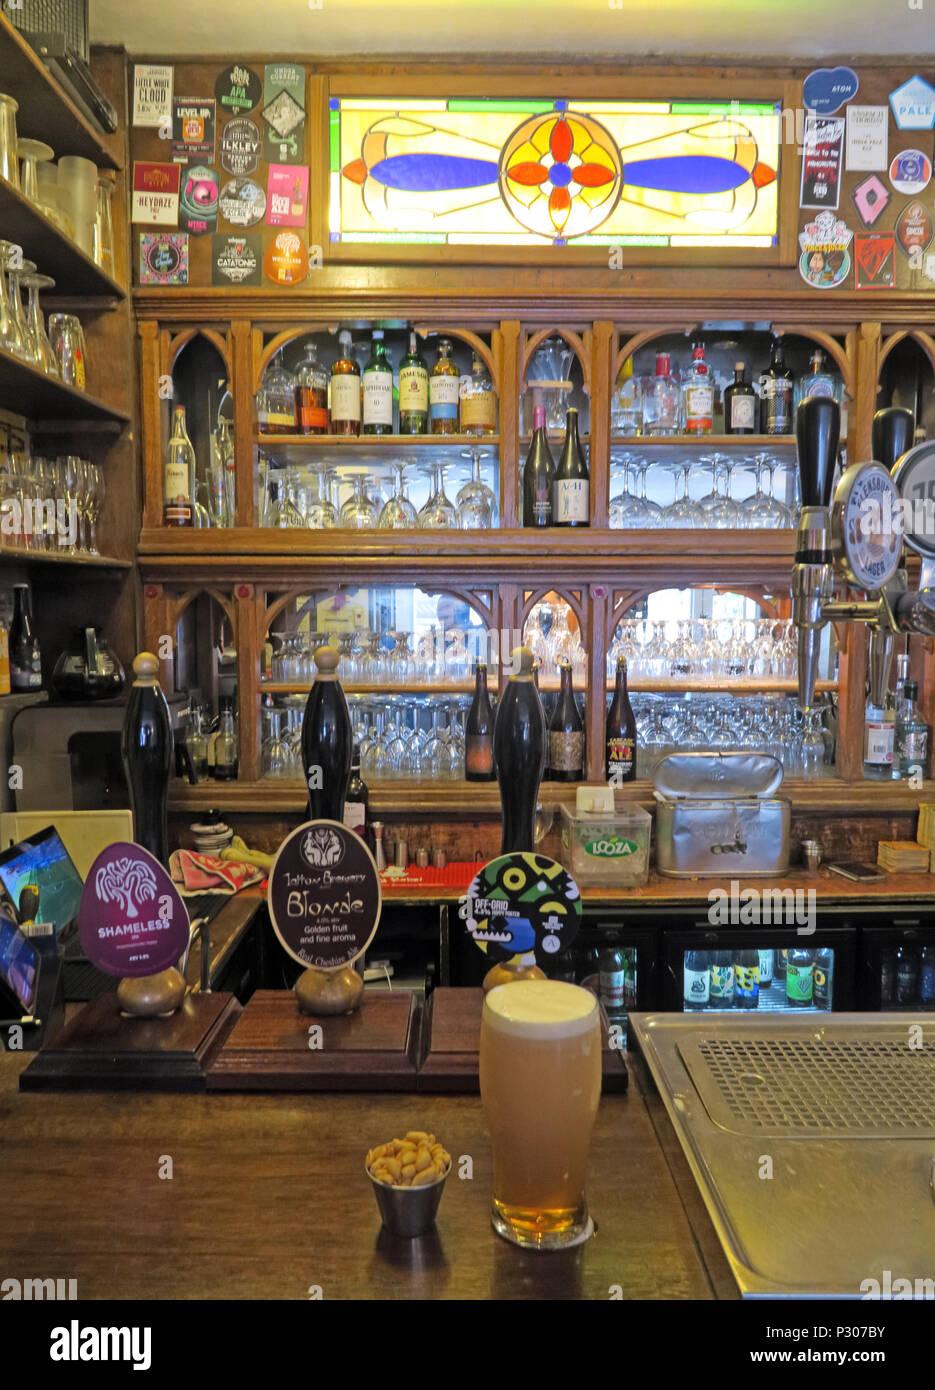 GoTonysmith,@HotpixUK,Trafford,Cheshire,shopping,retail,bar,ale,beer,CAMRA,pumps,tap,taps,pint,inside,interior,Altrincham,North